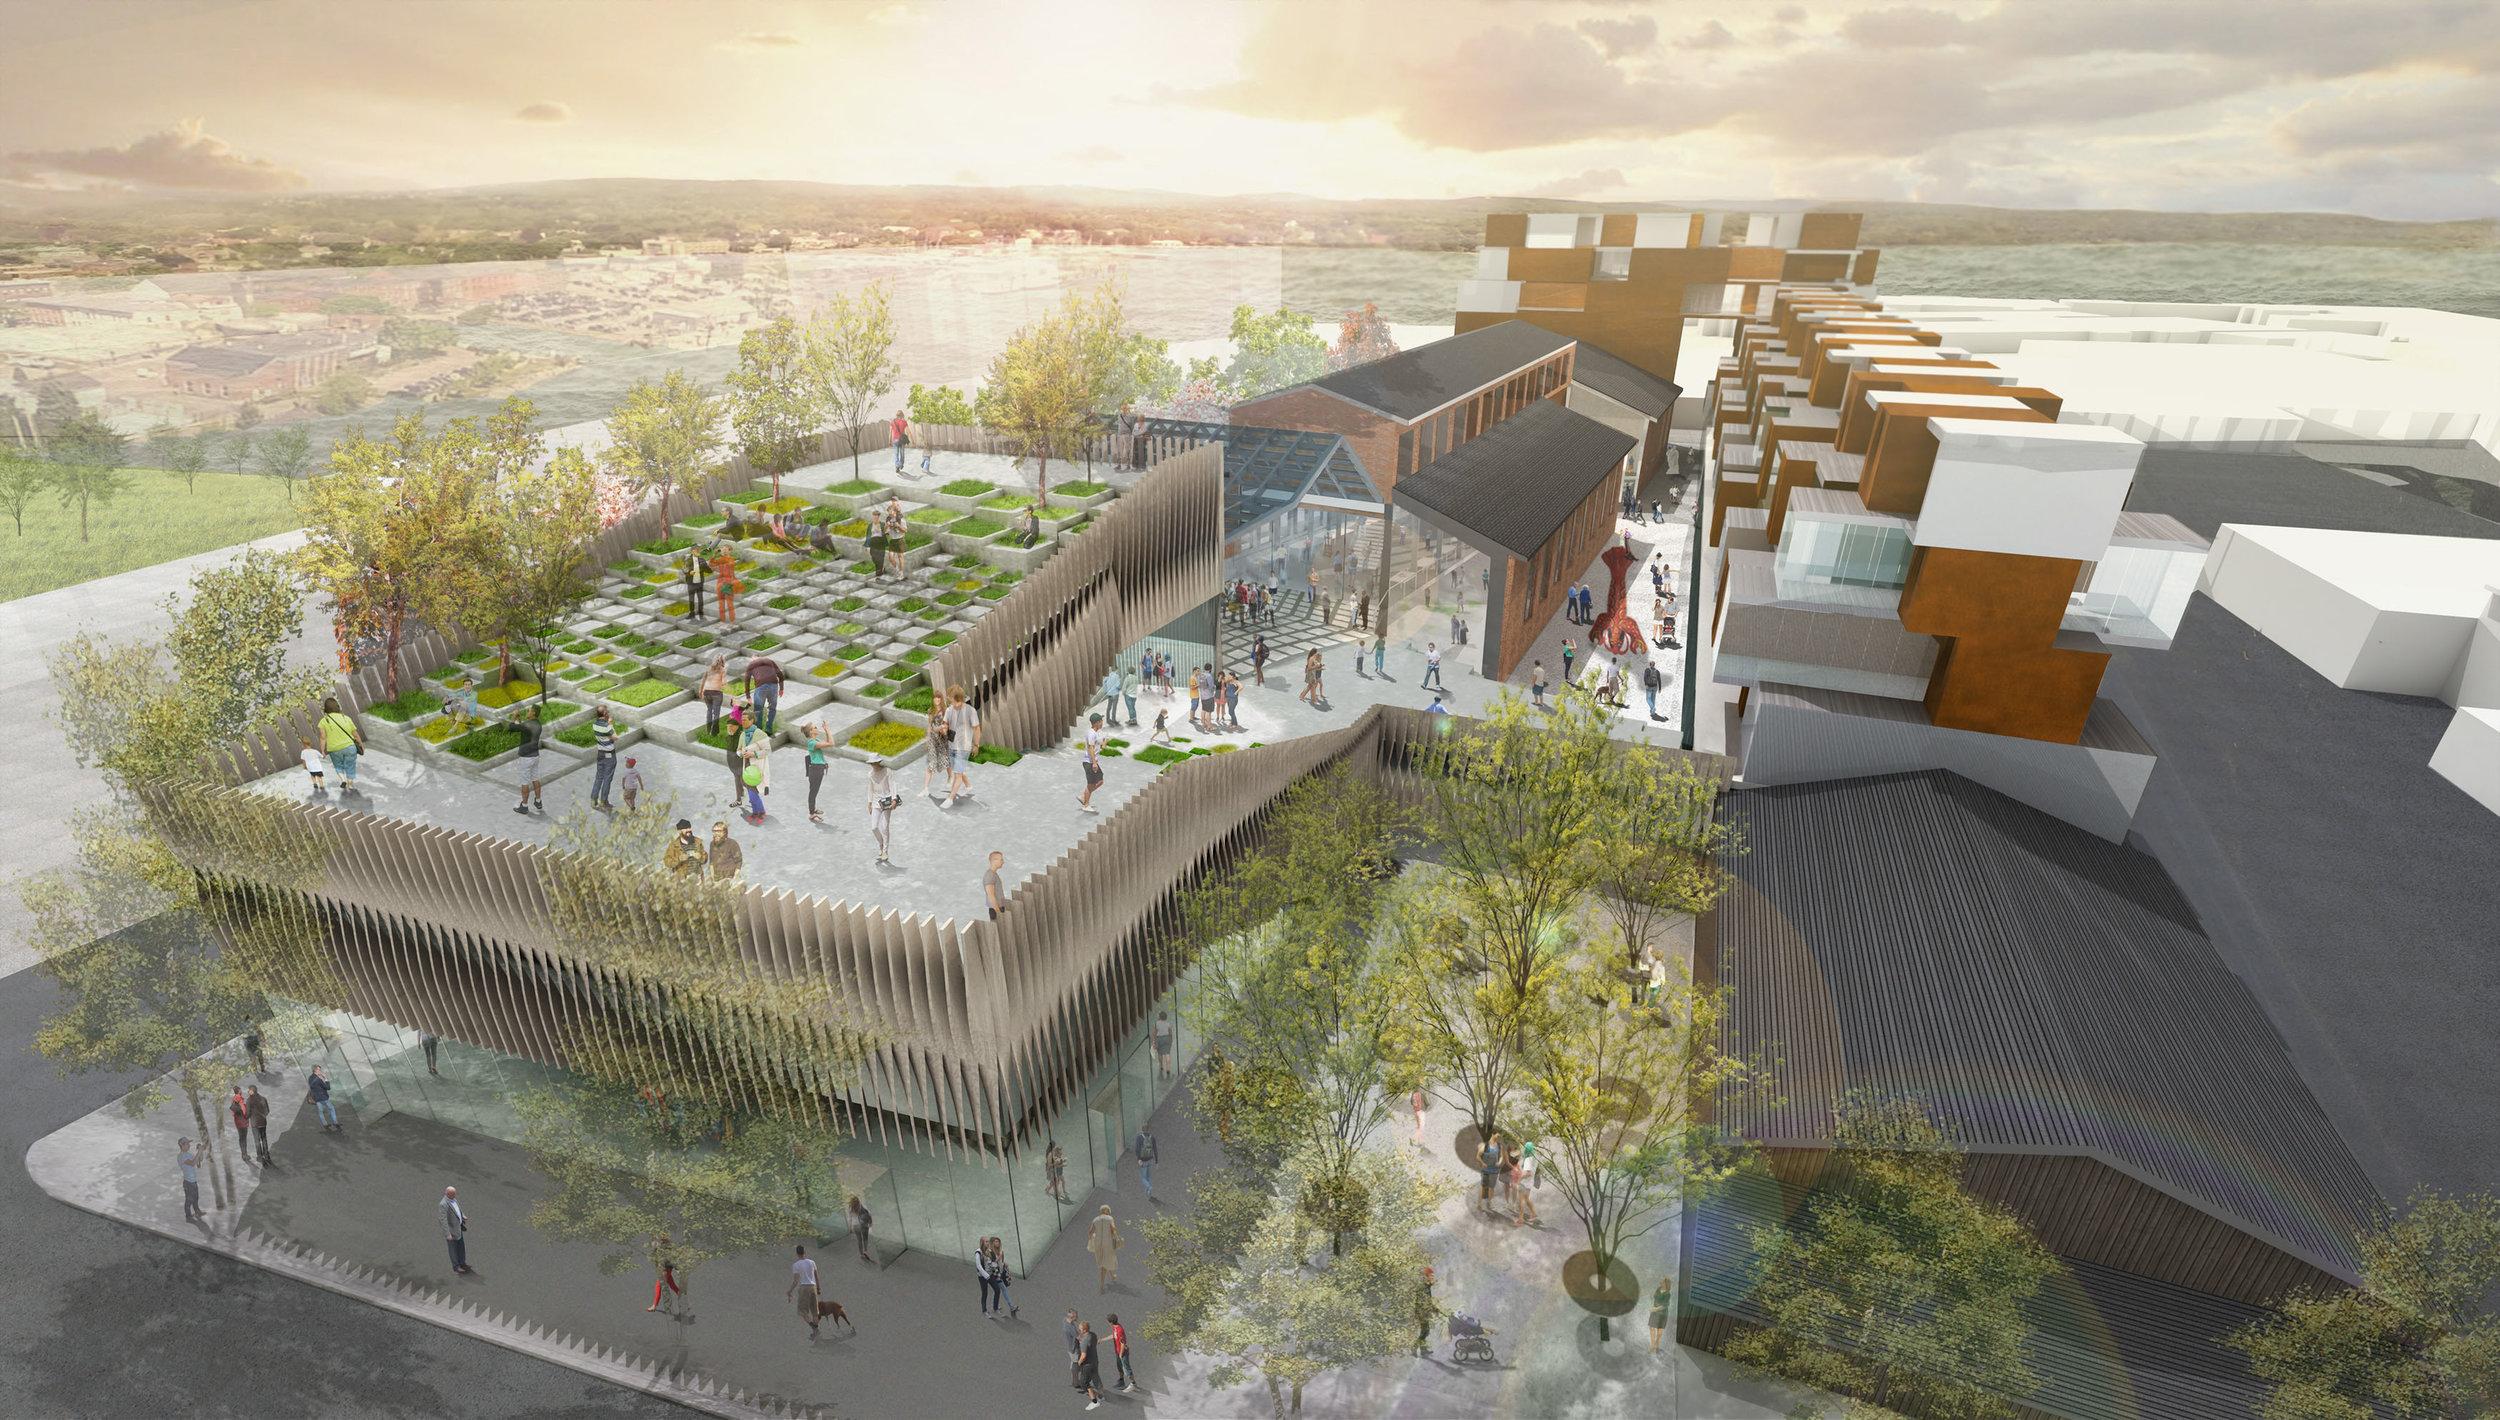 TentoOne_Beggars Wharf Arts Complex_062218_04_Arts Complex Aerial View.jpg